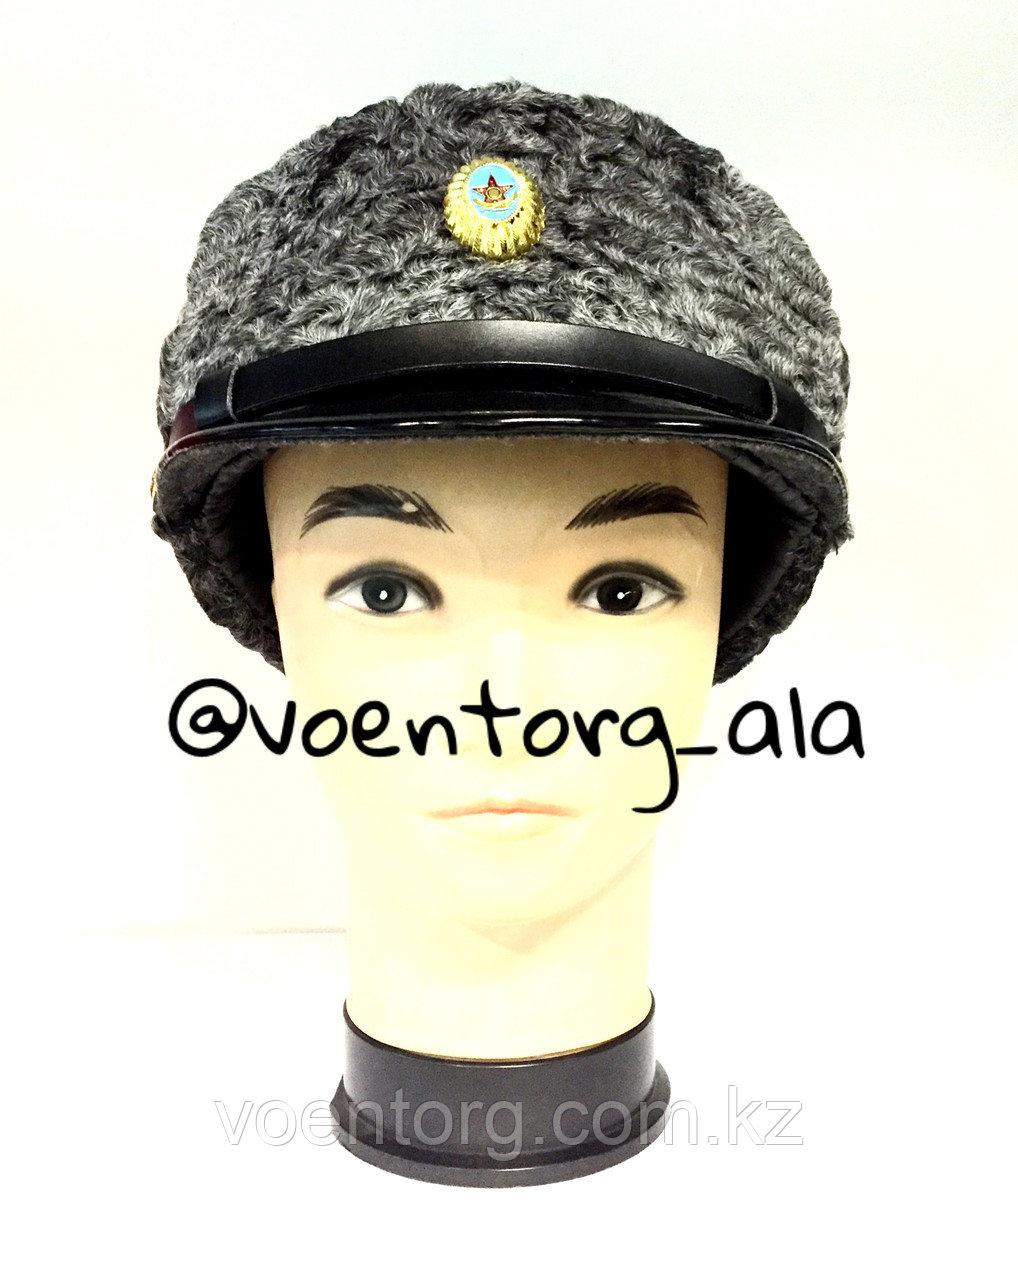 Офицерская каракулевая шапка